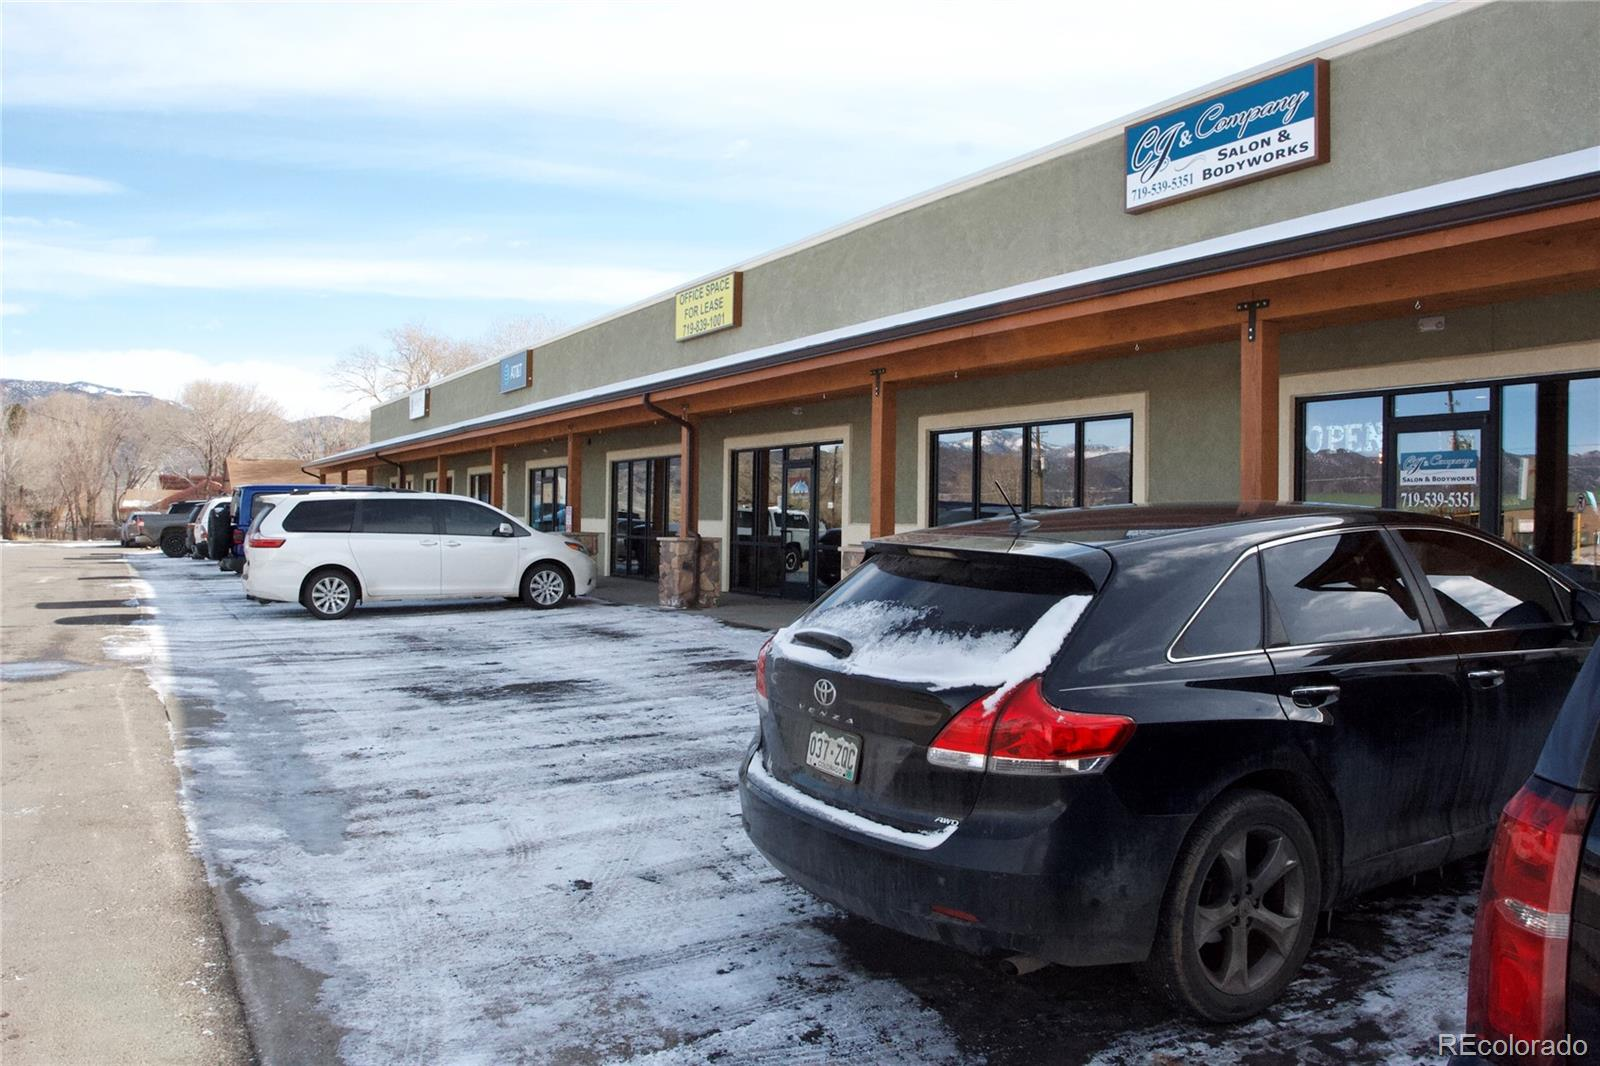 7800 W US Highway 50, Salida, CO 81201 - Salida, CO real estate listing